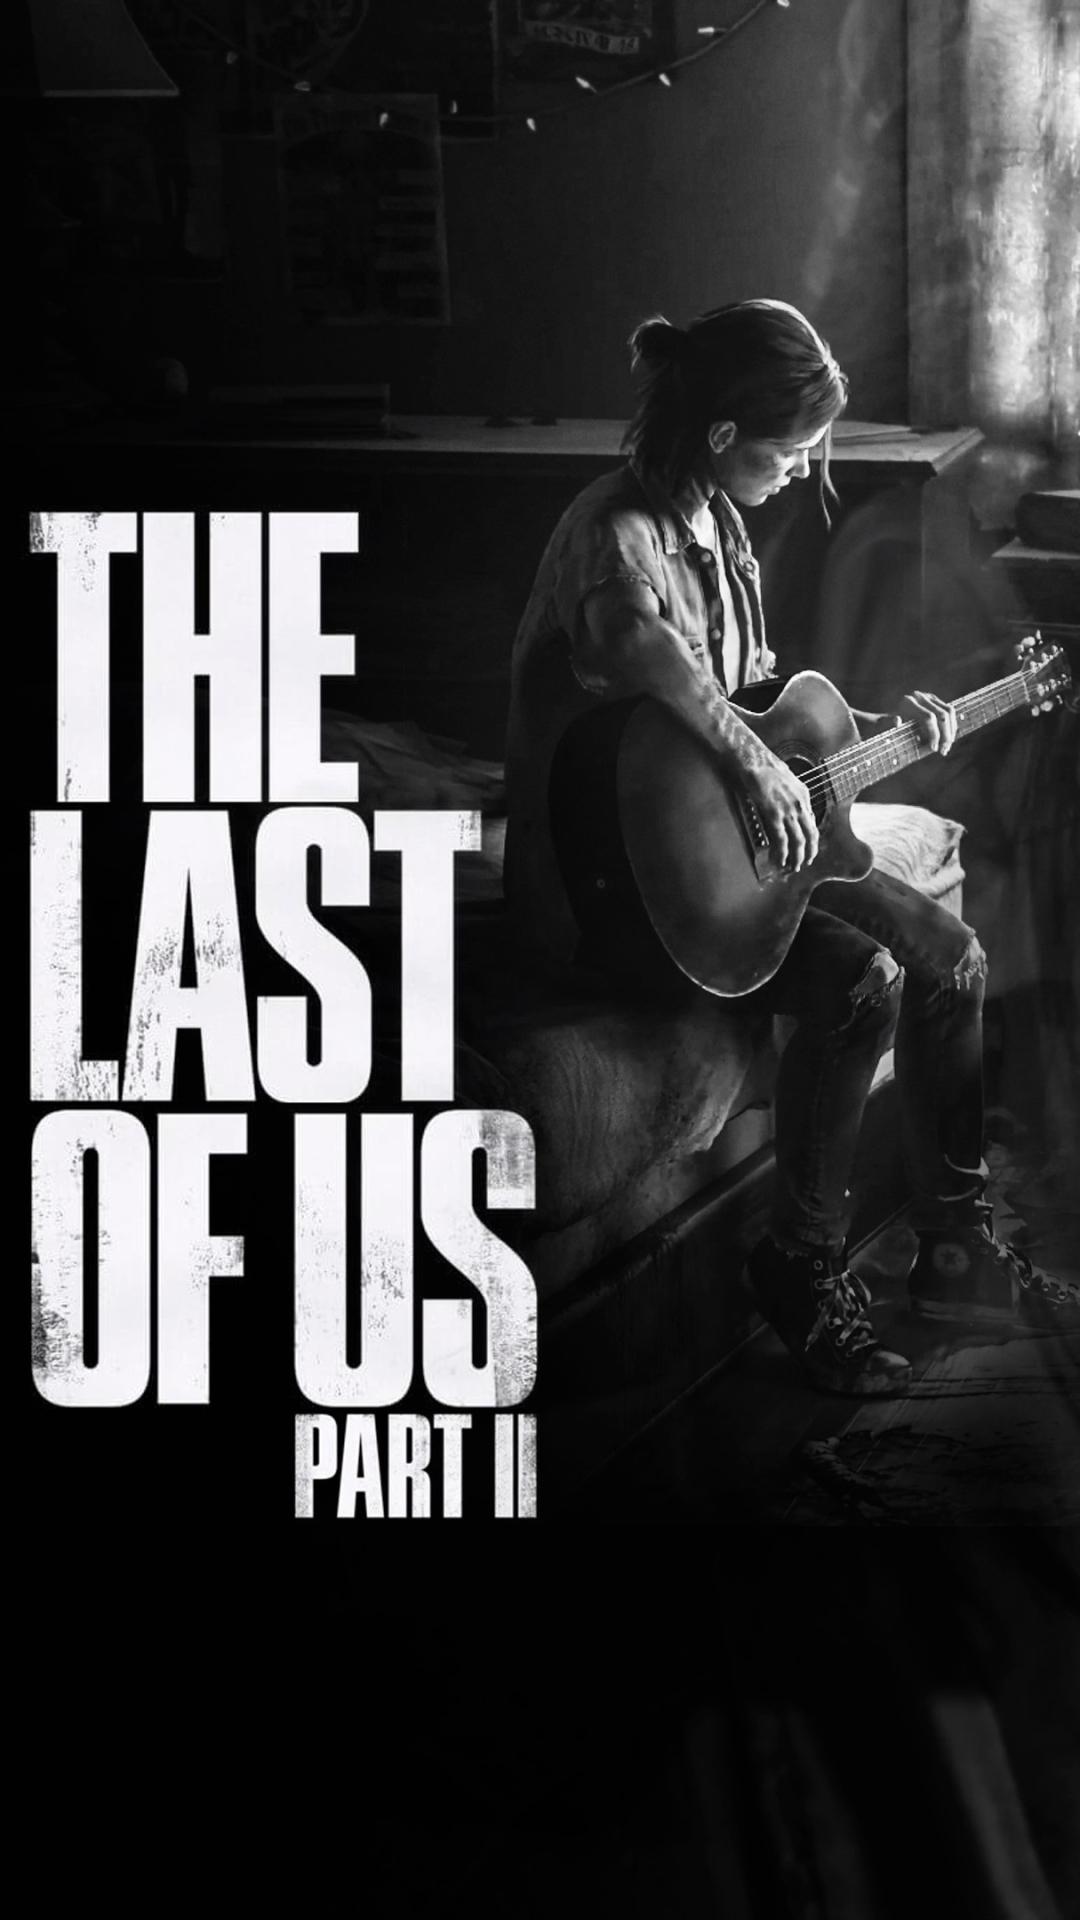 Video GameThe Last Of Us Part II 1080x1920 Wallpaper ID 669133 1080x1920